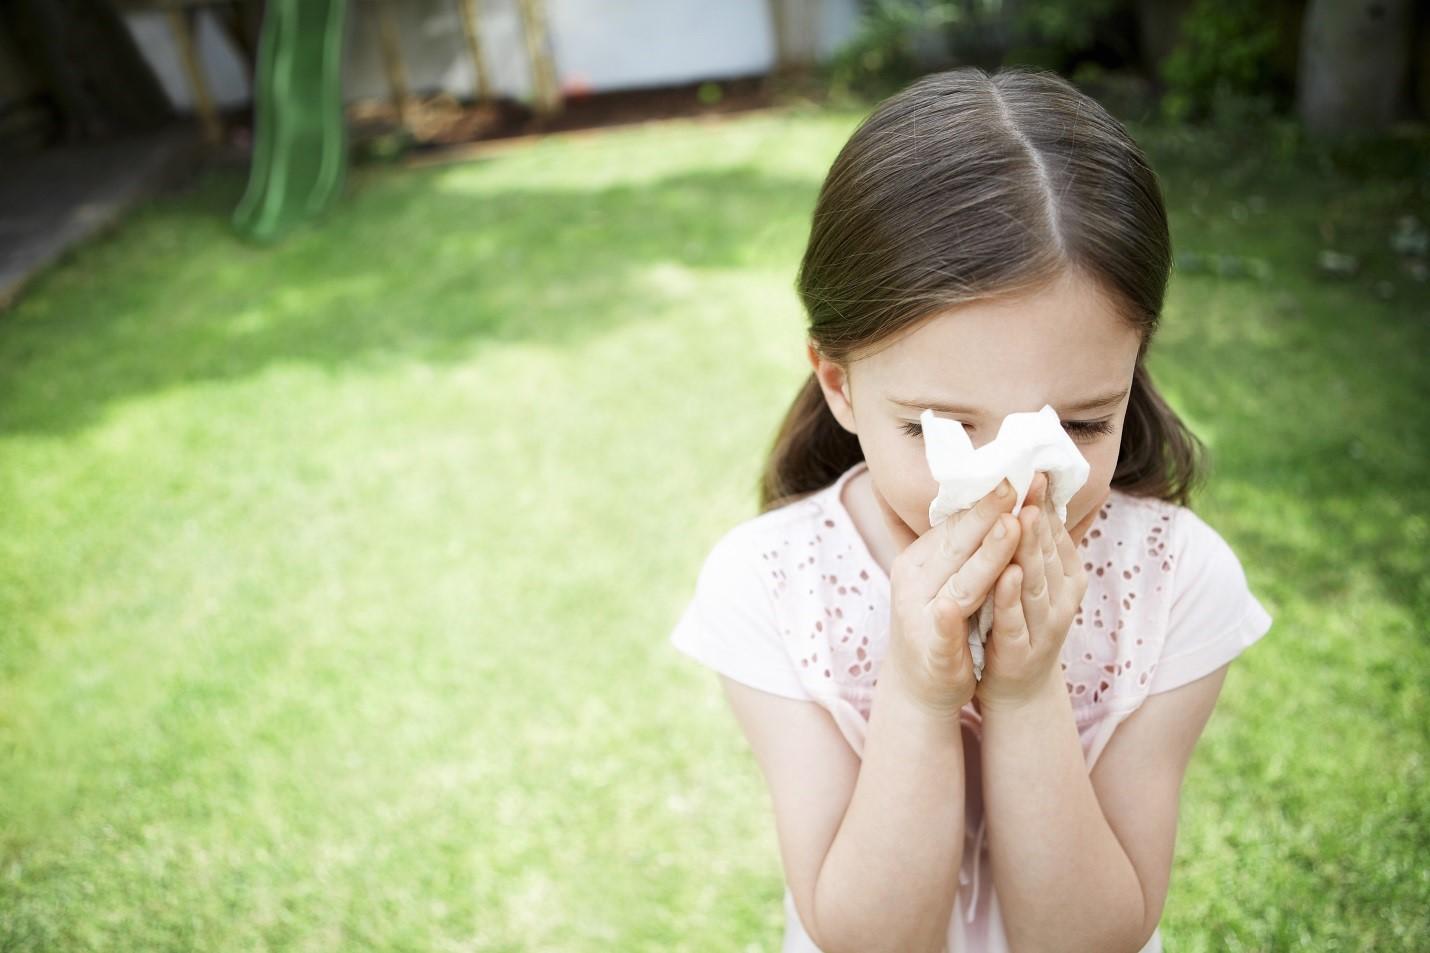 Moms! Ini Dia Cara Mudah Untuk Mencegah Penularan Virus Corona